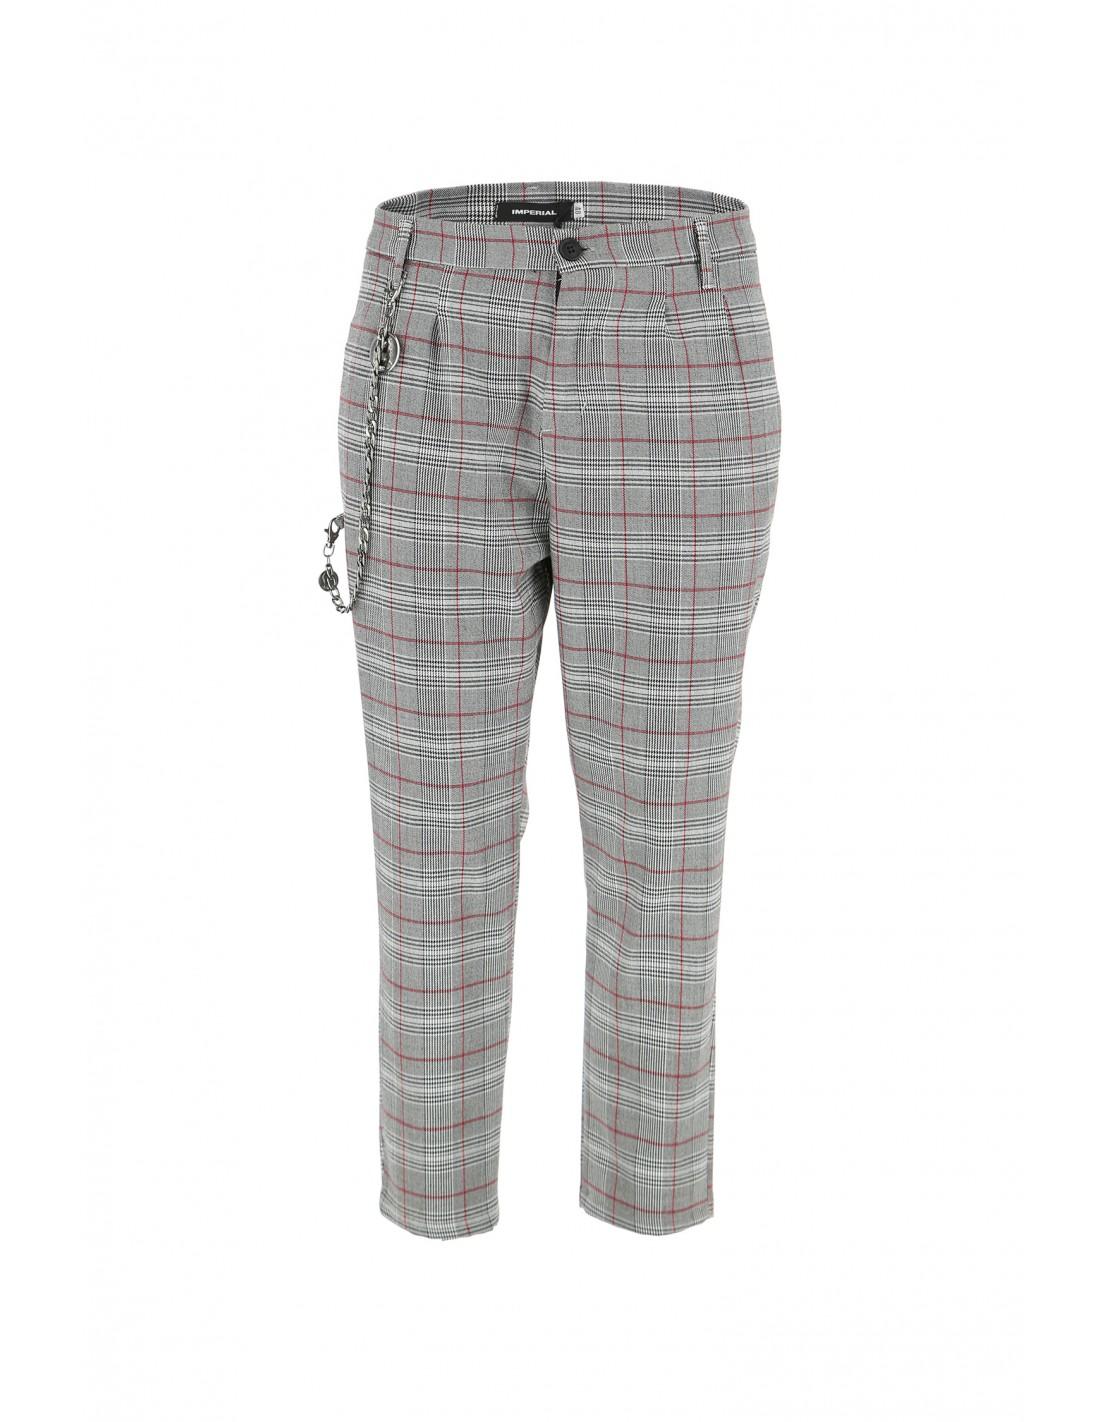 Esprit Sarouel De Pantalon Motif Imperial Gallles Prince 0wPX8knO